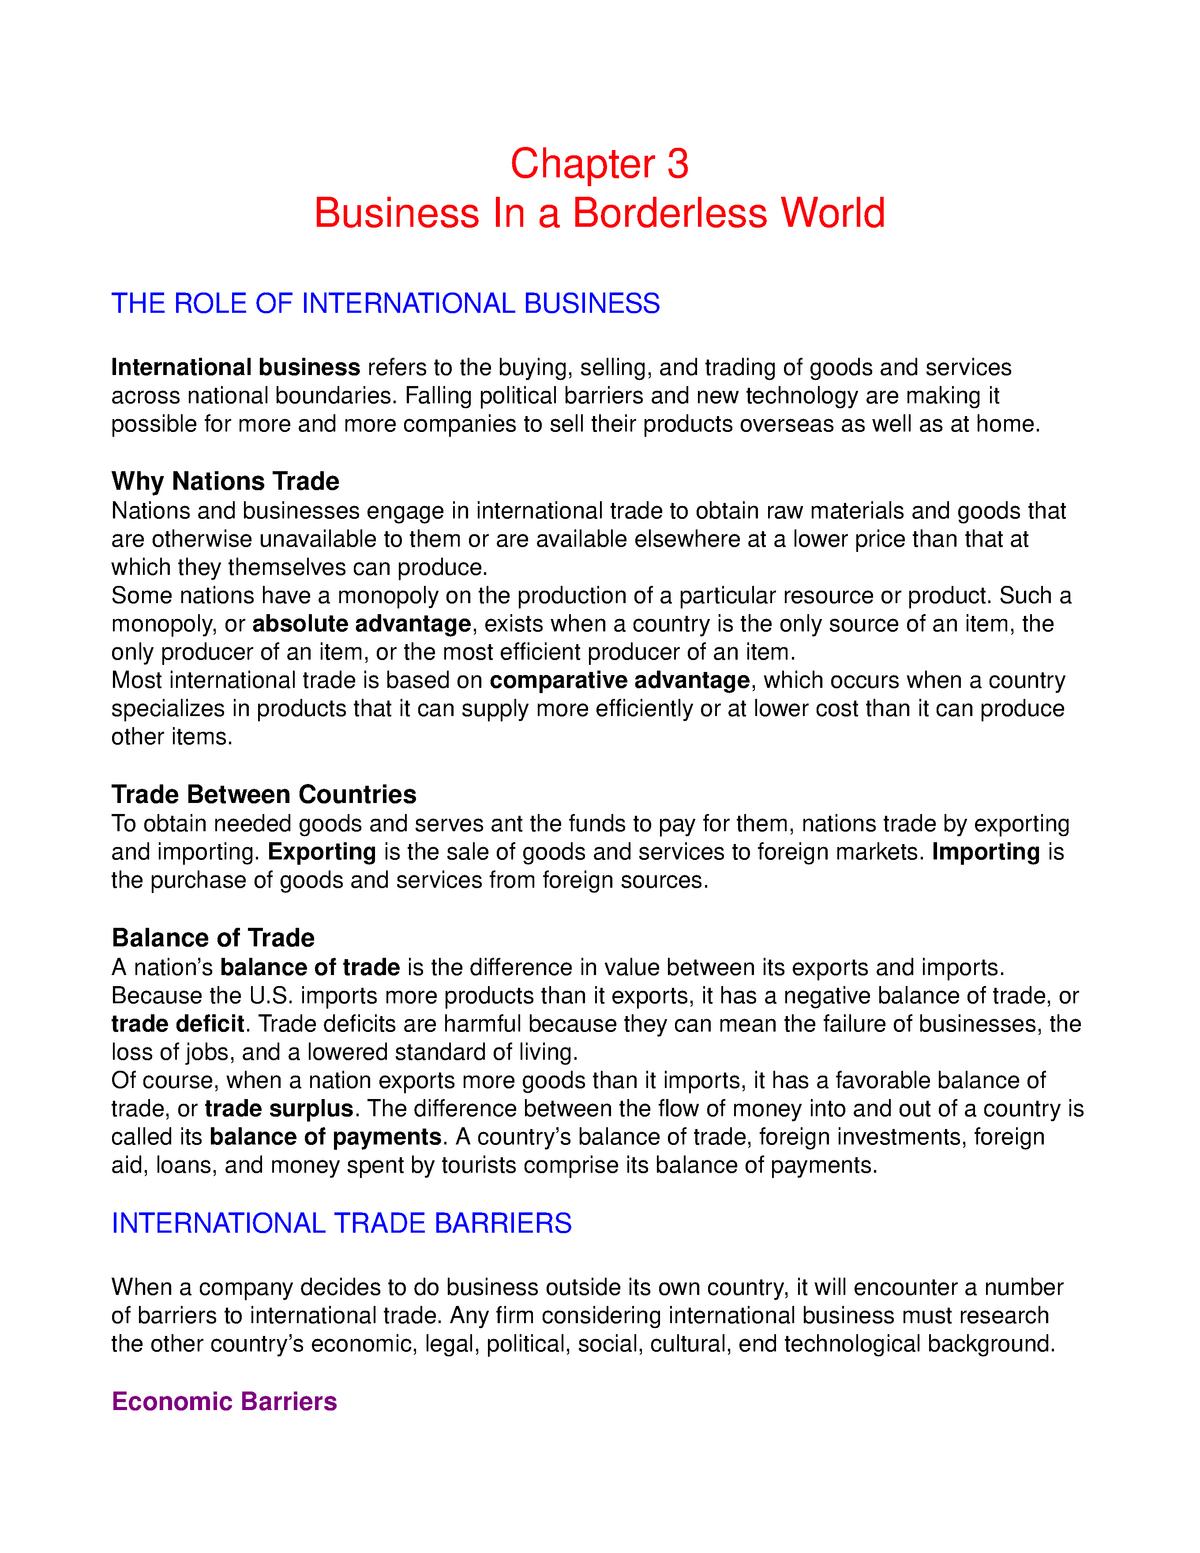 Business in a borderless World - BUS 104 - BMCC - StuDocu